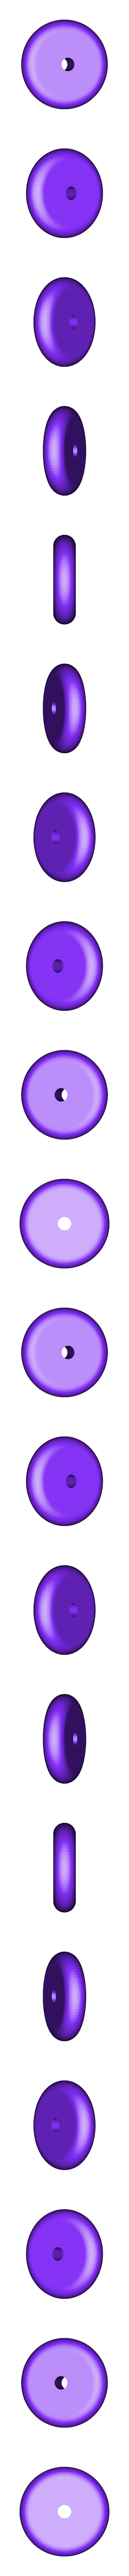 roue AV.STL Download free STL file Parrot Disco - Landing gear • Object to 3D print, larcenn